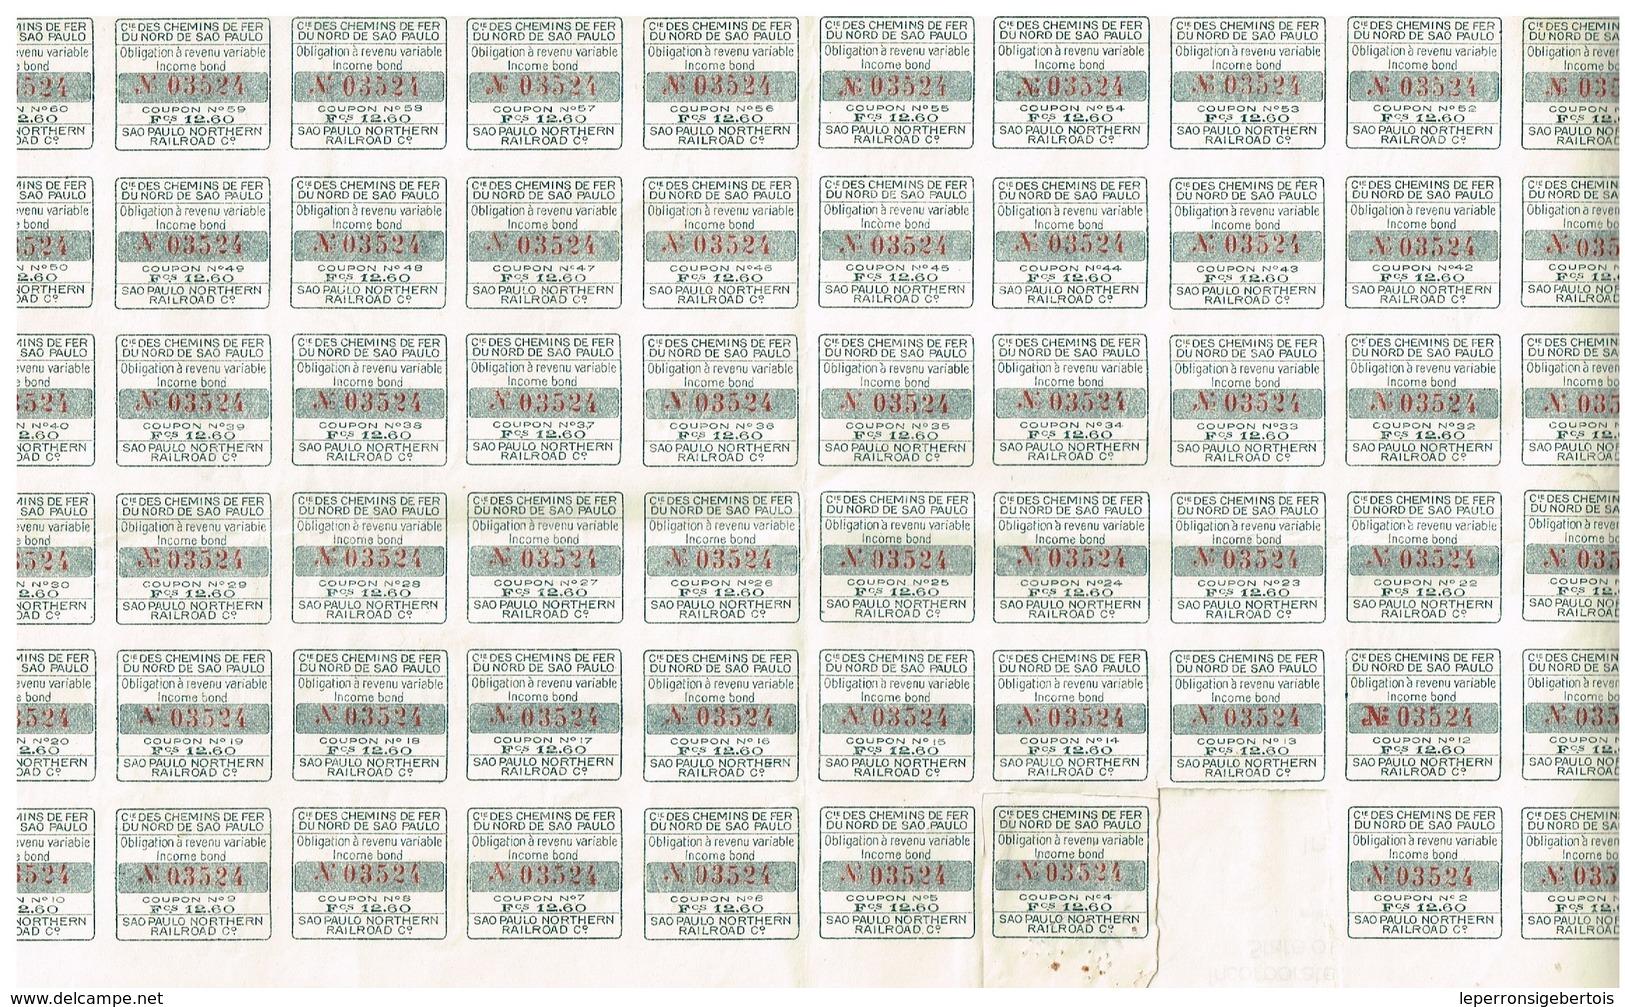 Titre Ancien - Compagnie Des Chemins De Fer Du Nord De Sao Paulo -sao Paulo Northern Railroad Company  - Titre De 1916 - Chemin De Fer & Tramway